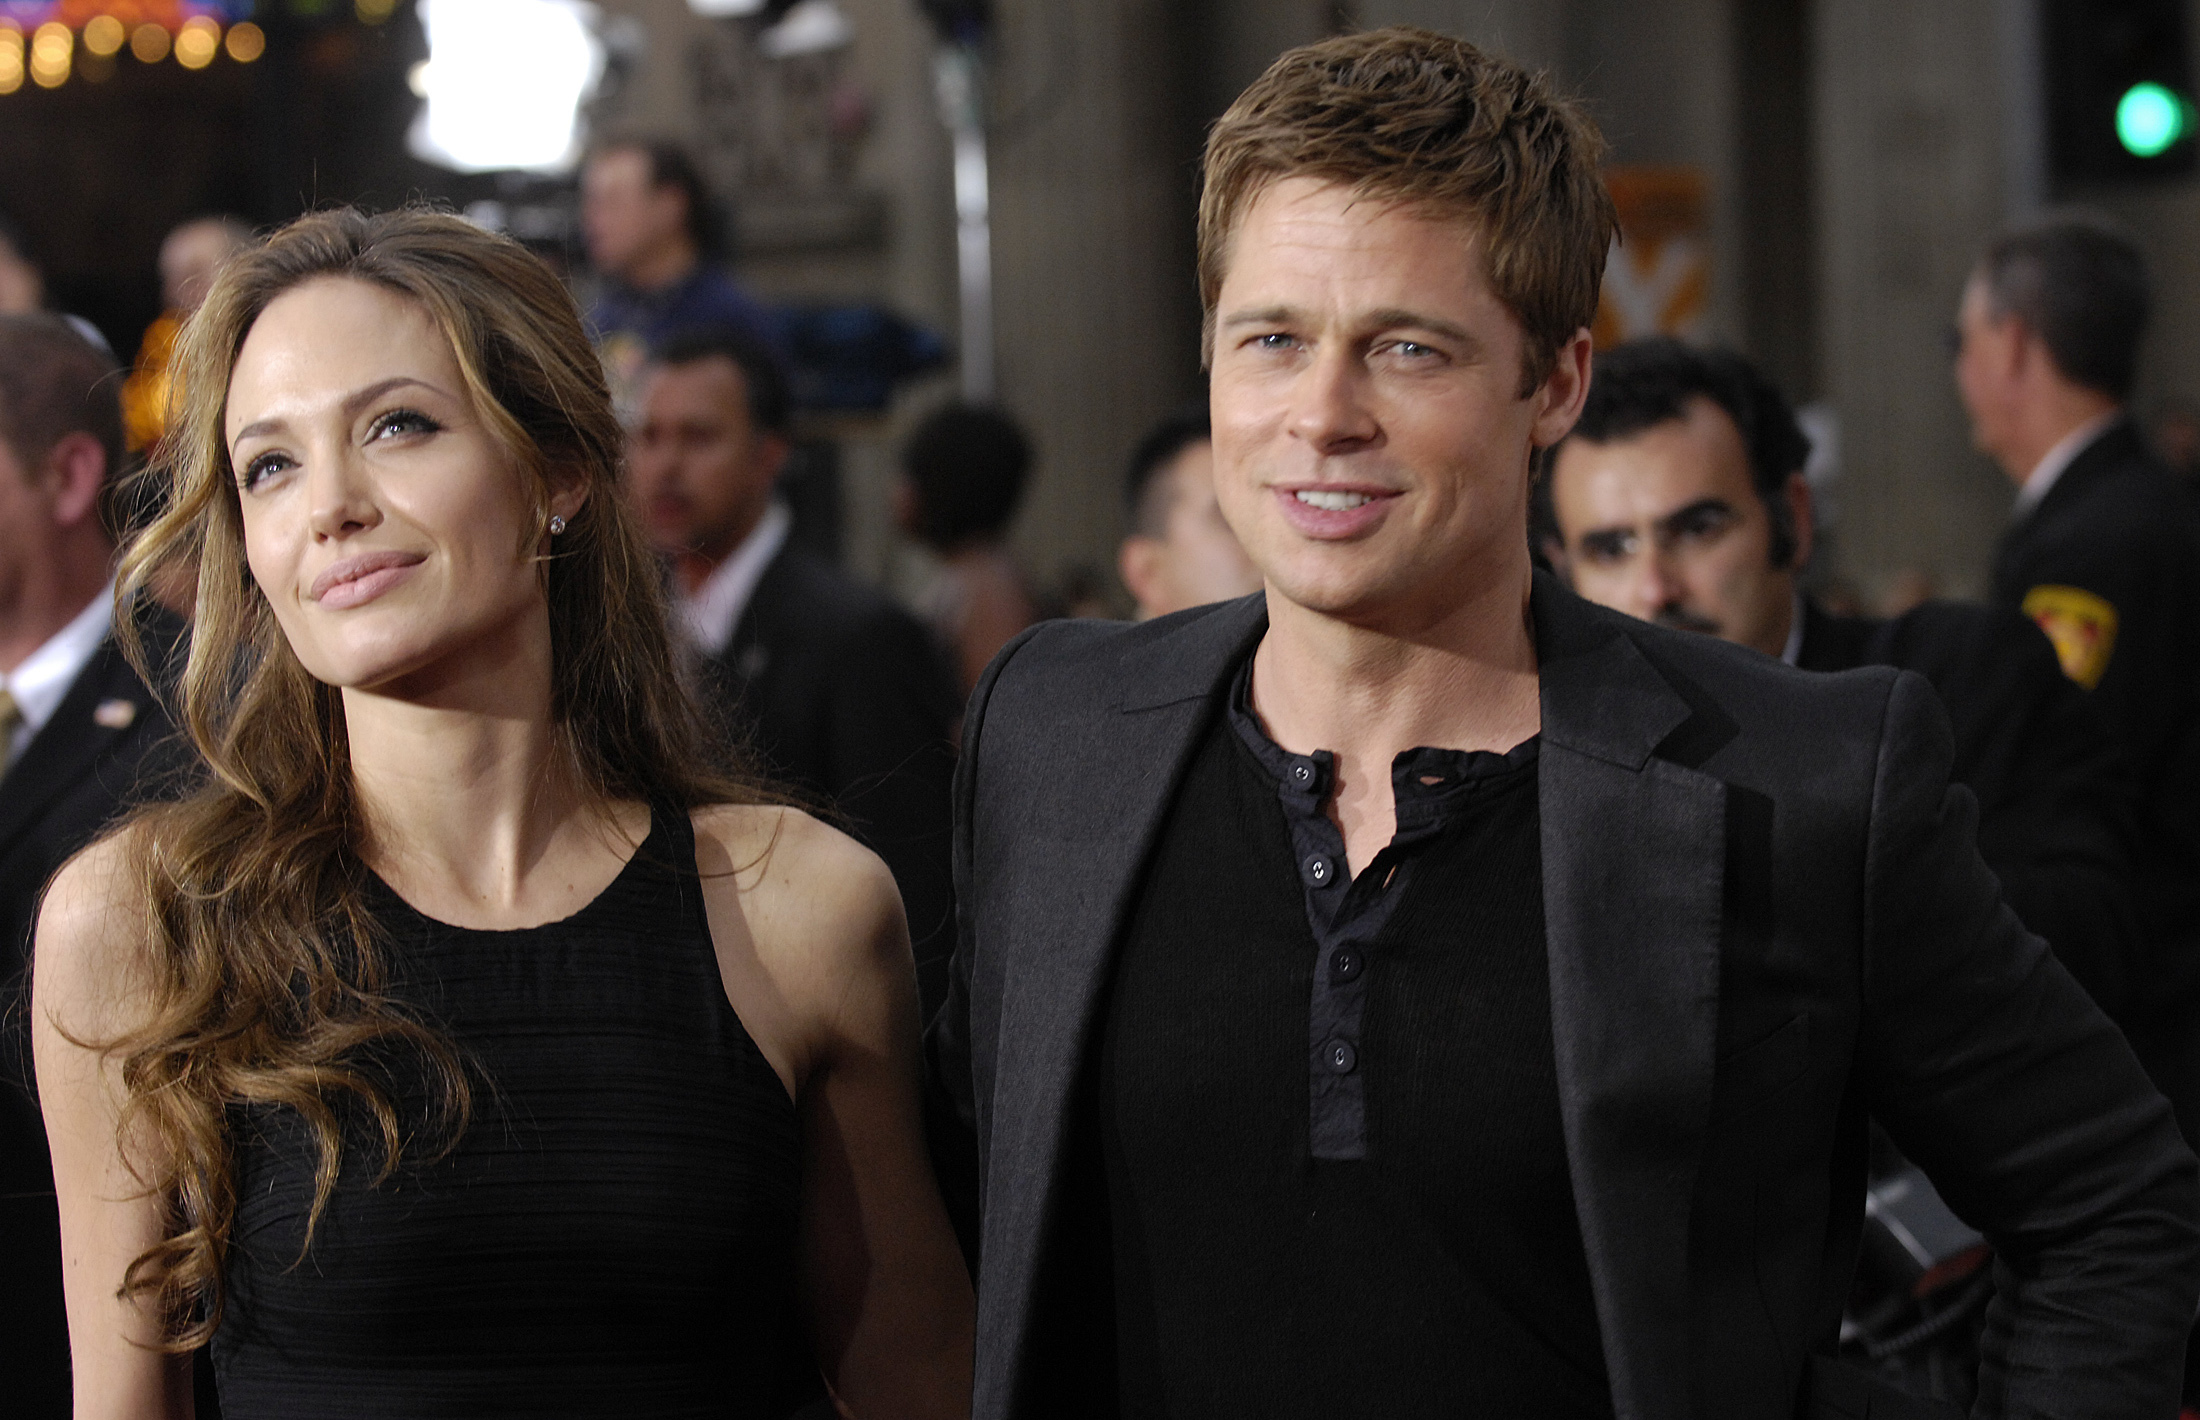 Angelina Jolie Granted Temporary Custody of Children, Brad Pitt Will Undergo Random Drug Testing